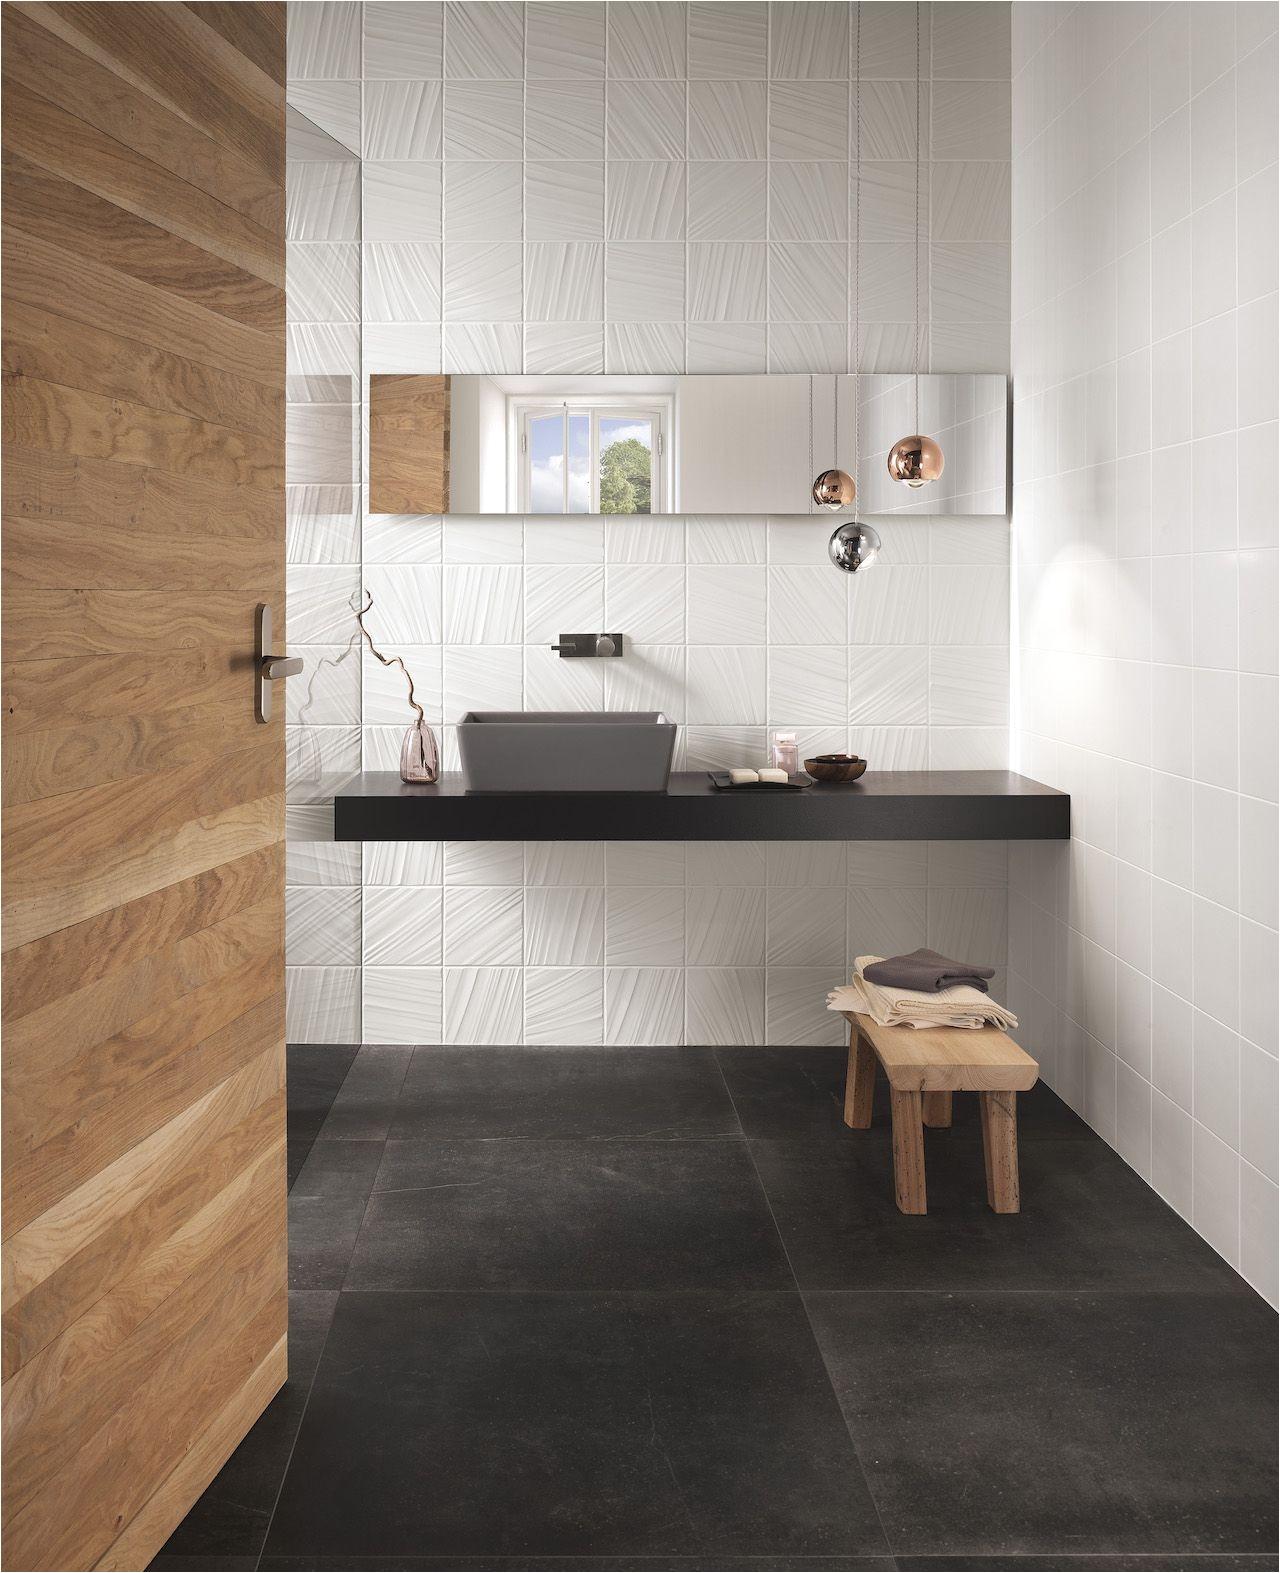 Porcelain Floor Tiles Porcelain Kitchen Floor Tiles Floor Plan Ideas